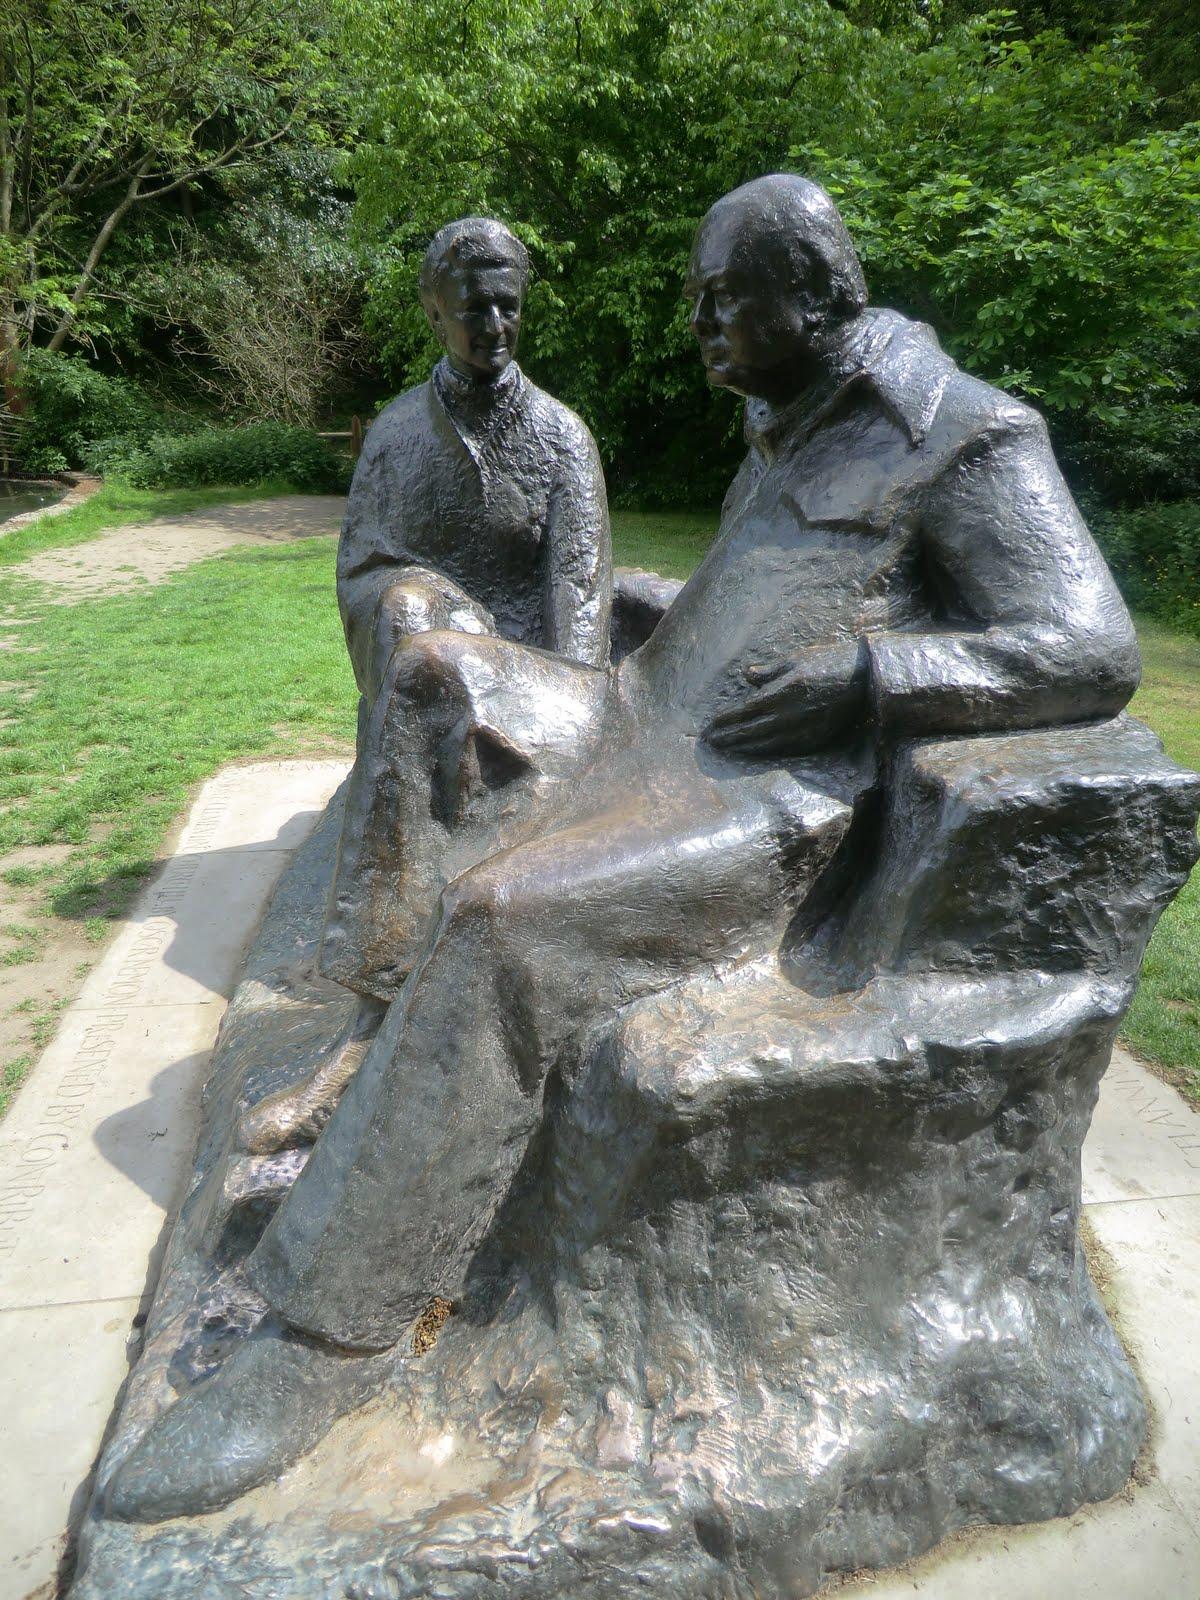 CIMG4376 Oscar Nemon statue of Winston & Clementine Churchill, Chartwell